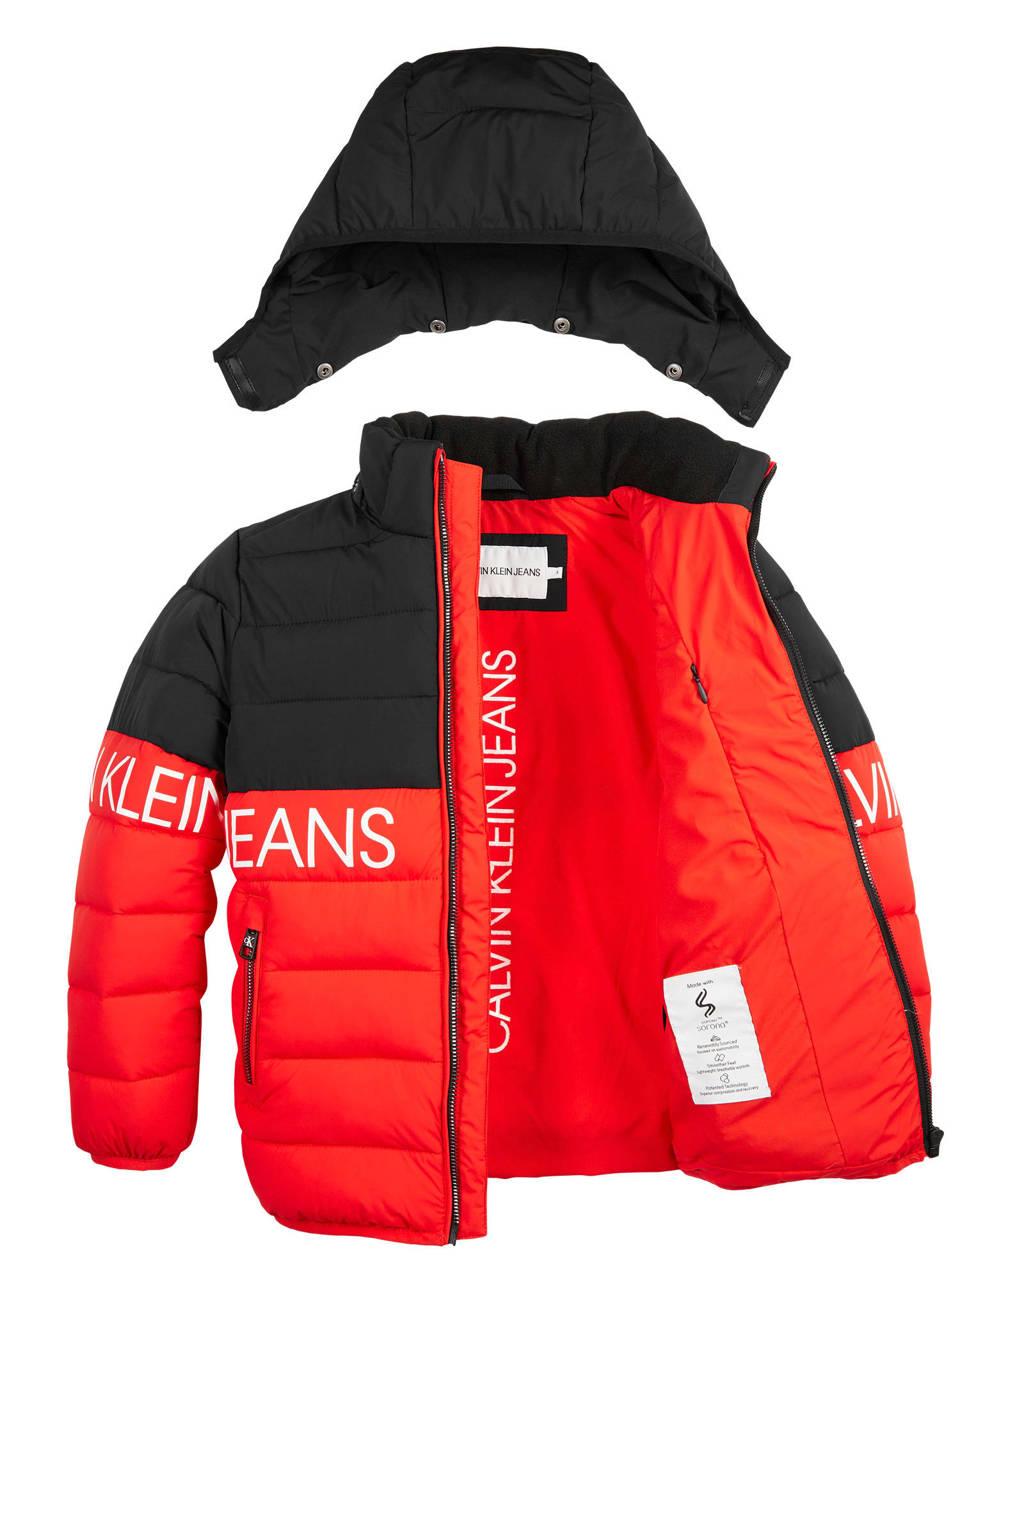 CALVIN KLEIN JEANS gewatteerde winterjas rood/zwart, Rood/zwart